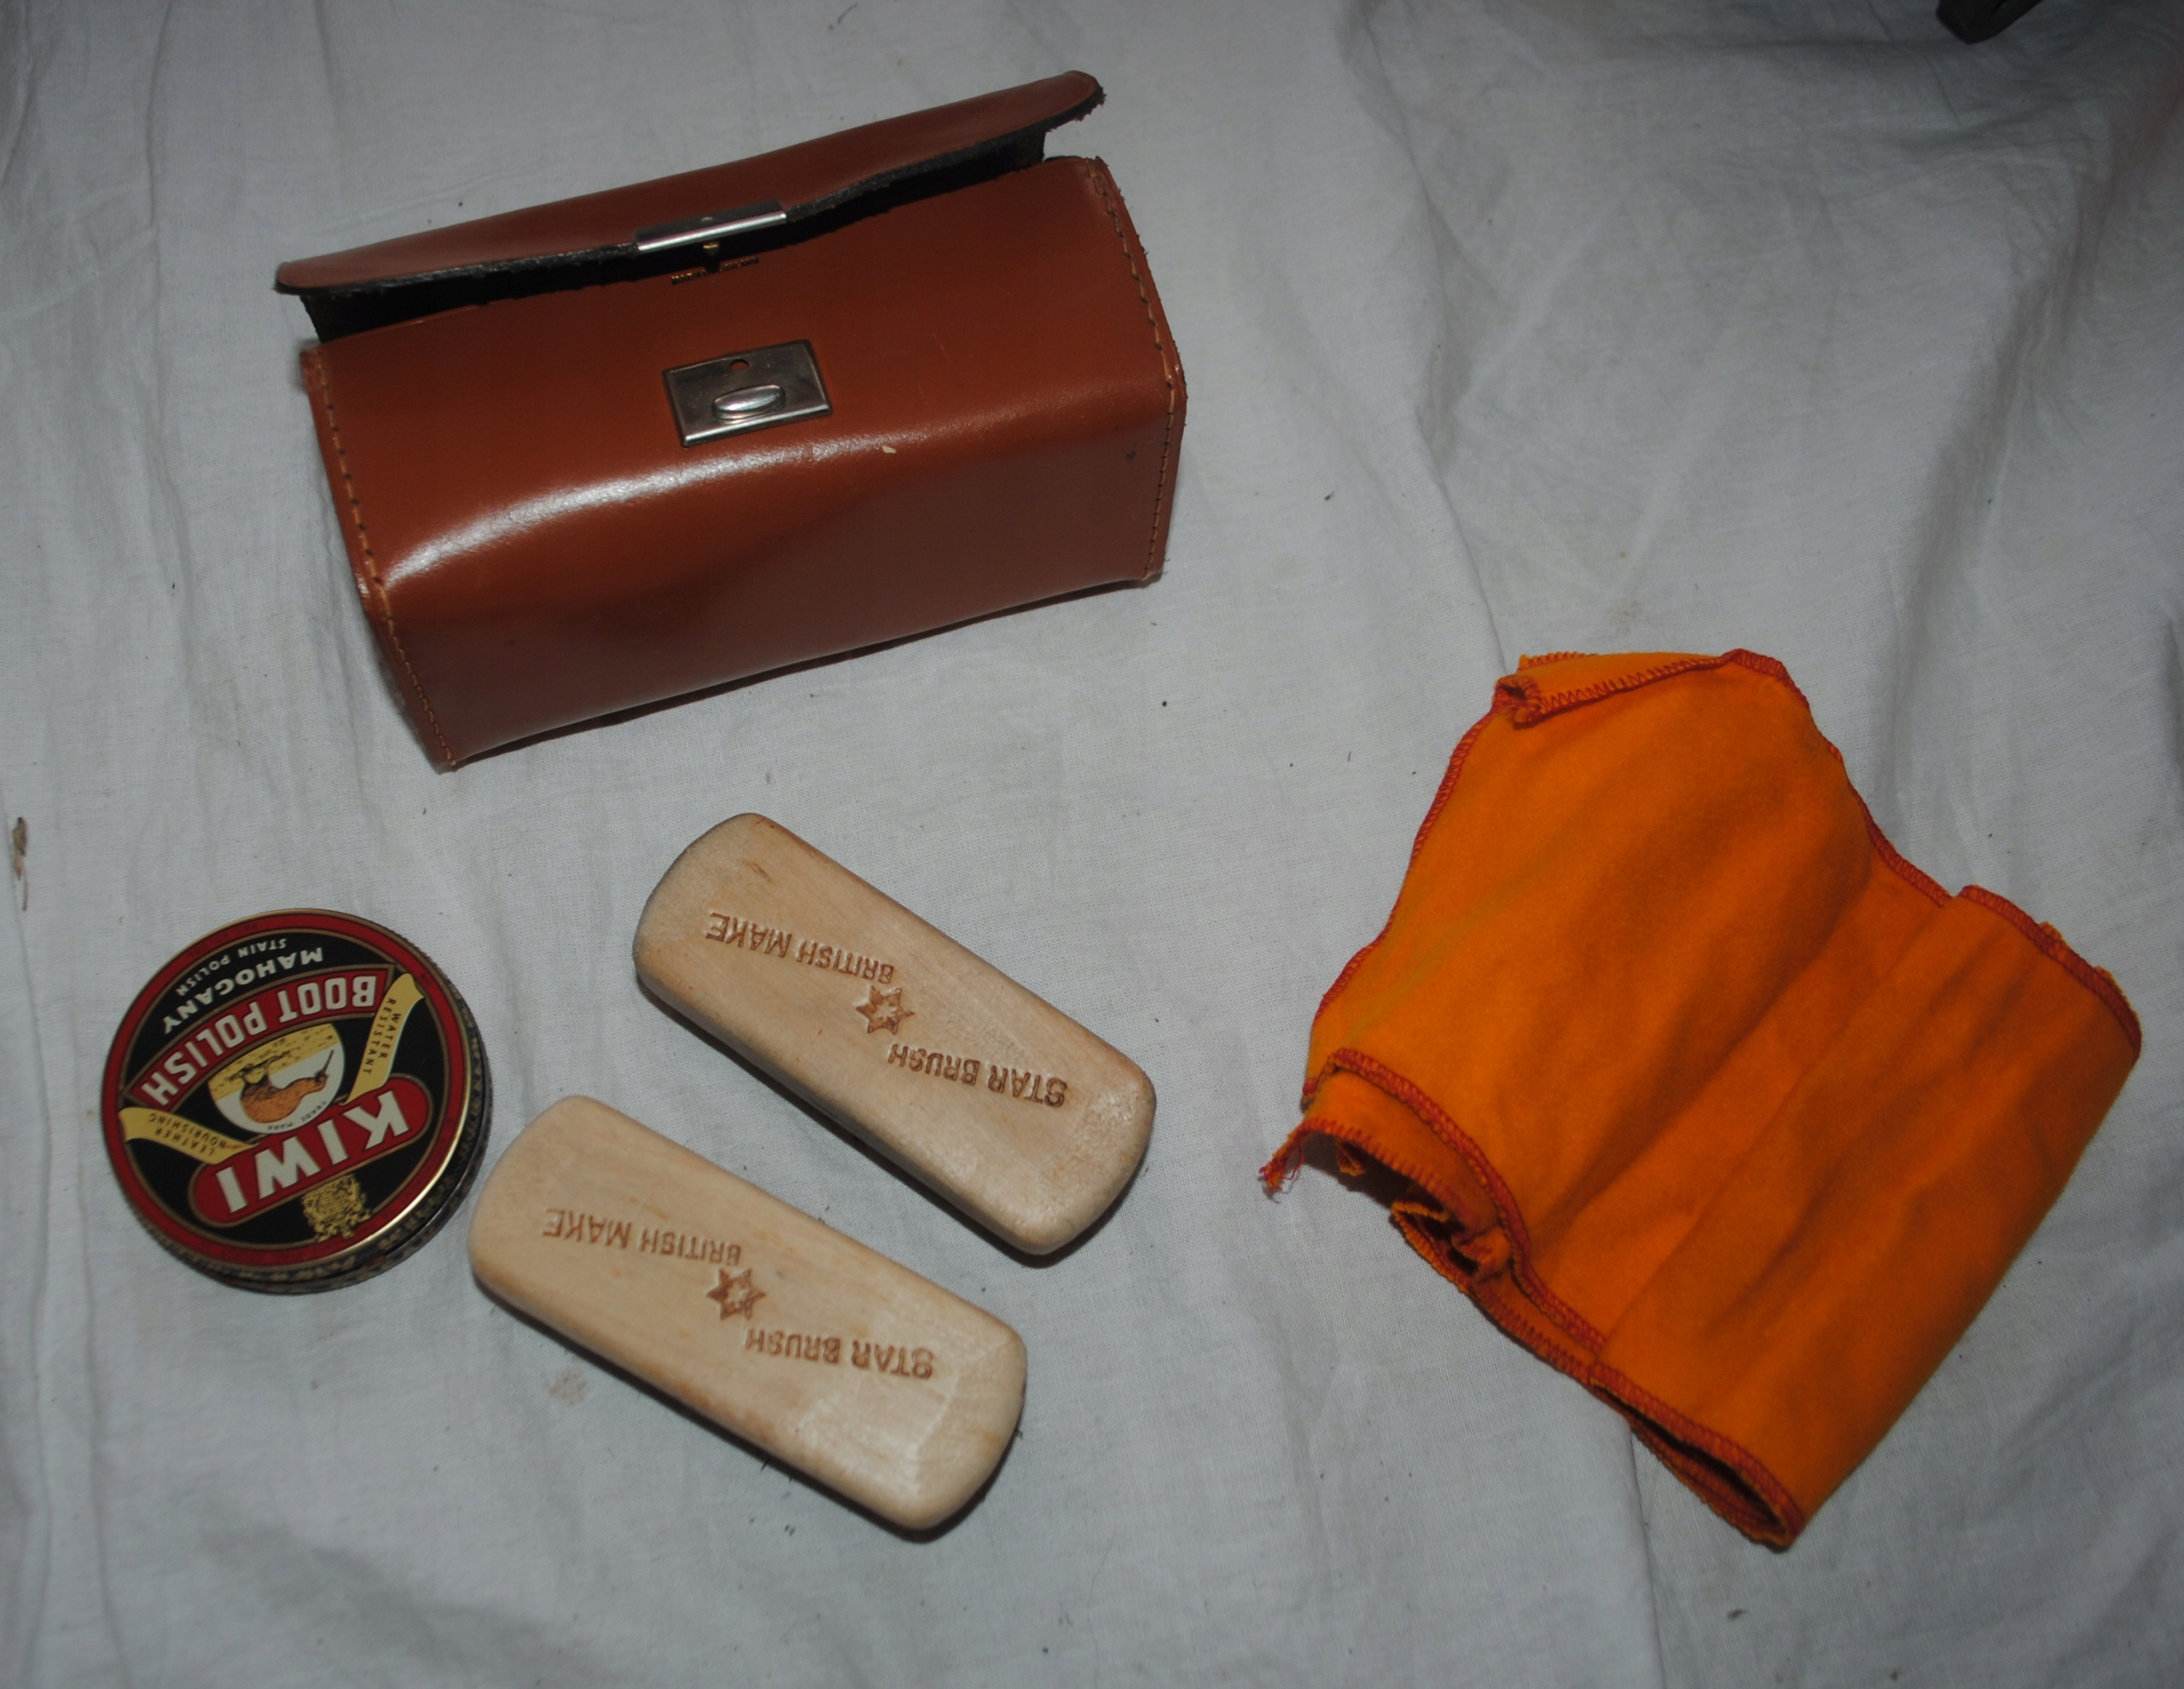 KIWI крем для обуви + футлярные щетки из Англии